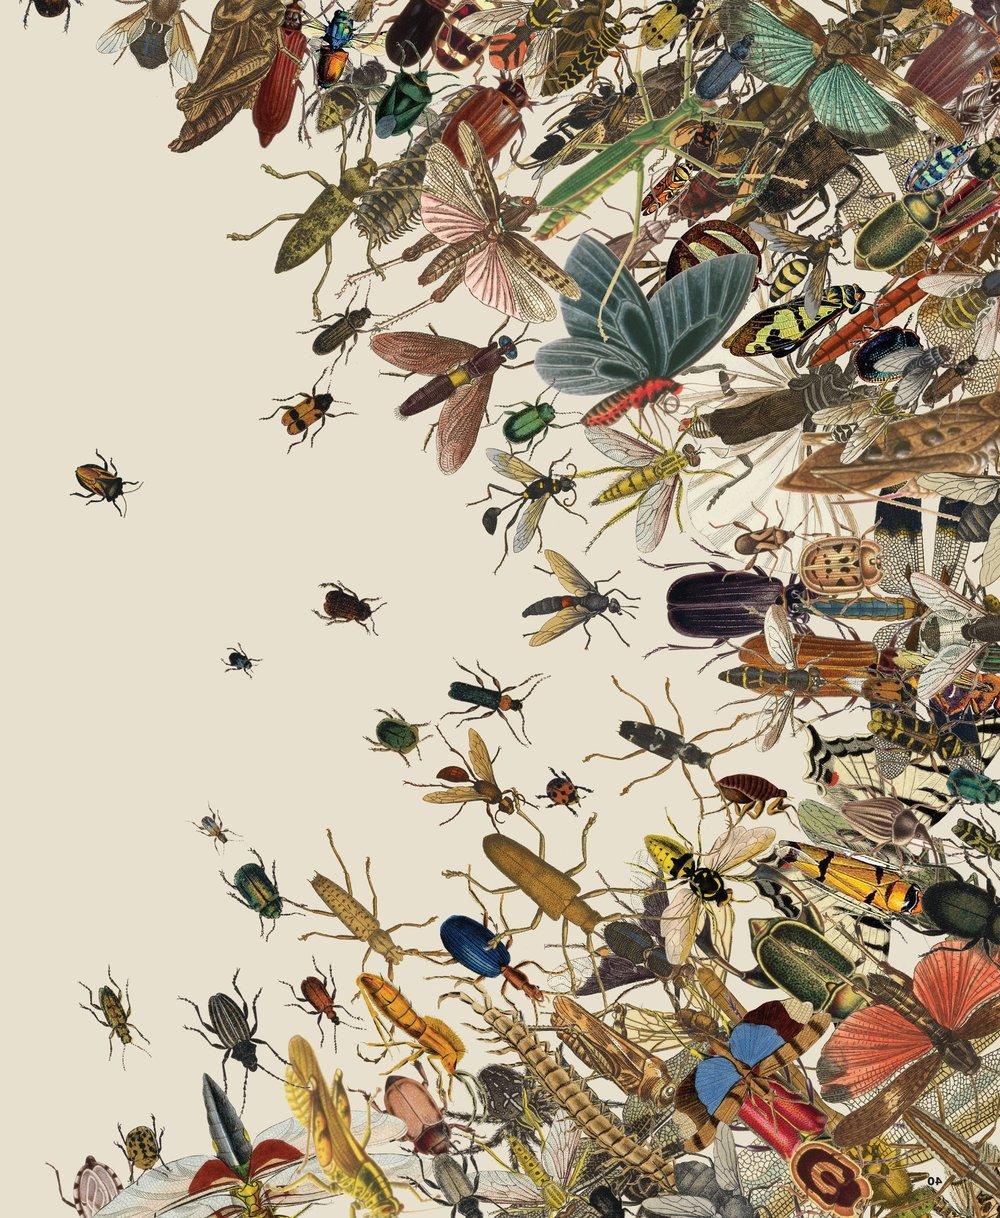 02mag-insects-image1-superJumbo-v3.jpg